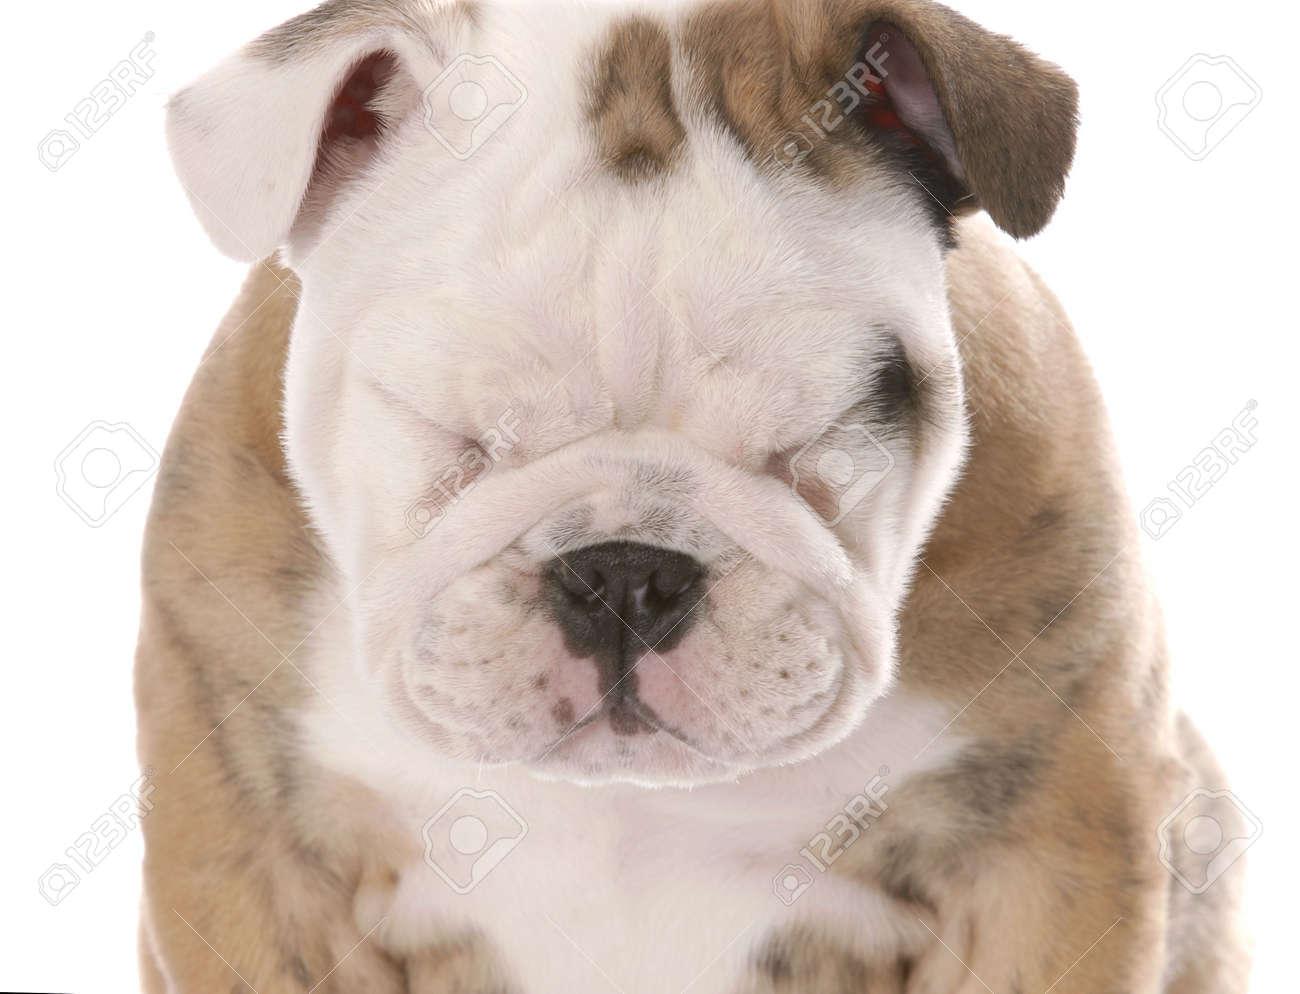 english bulldog puppy squinting isolated on white background Stock Photo - 6347363